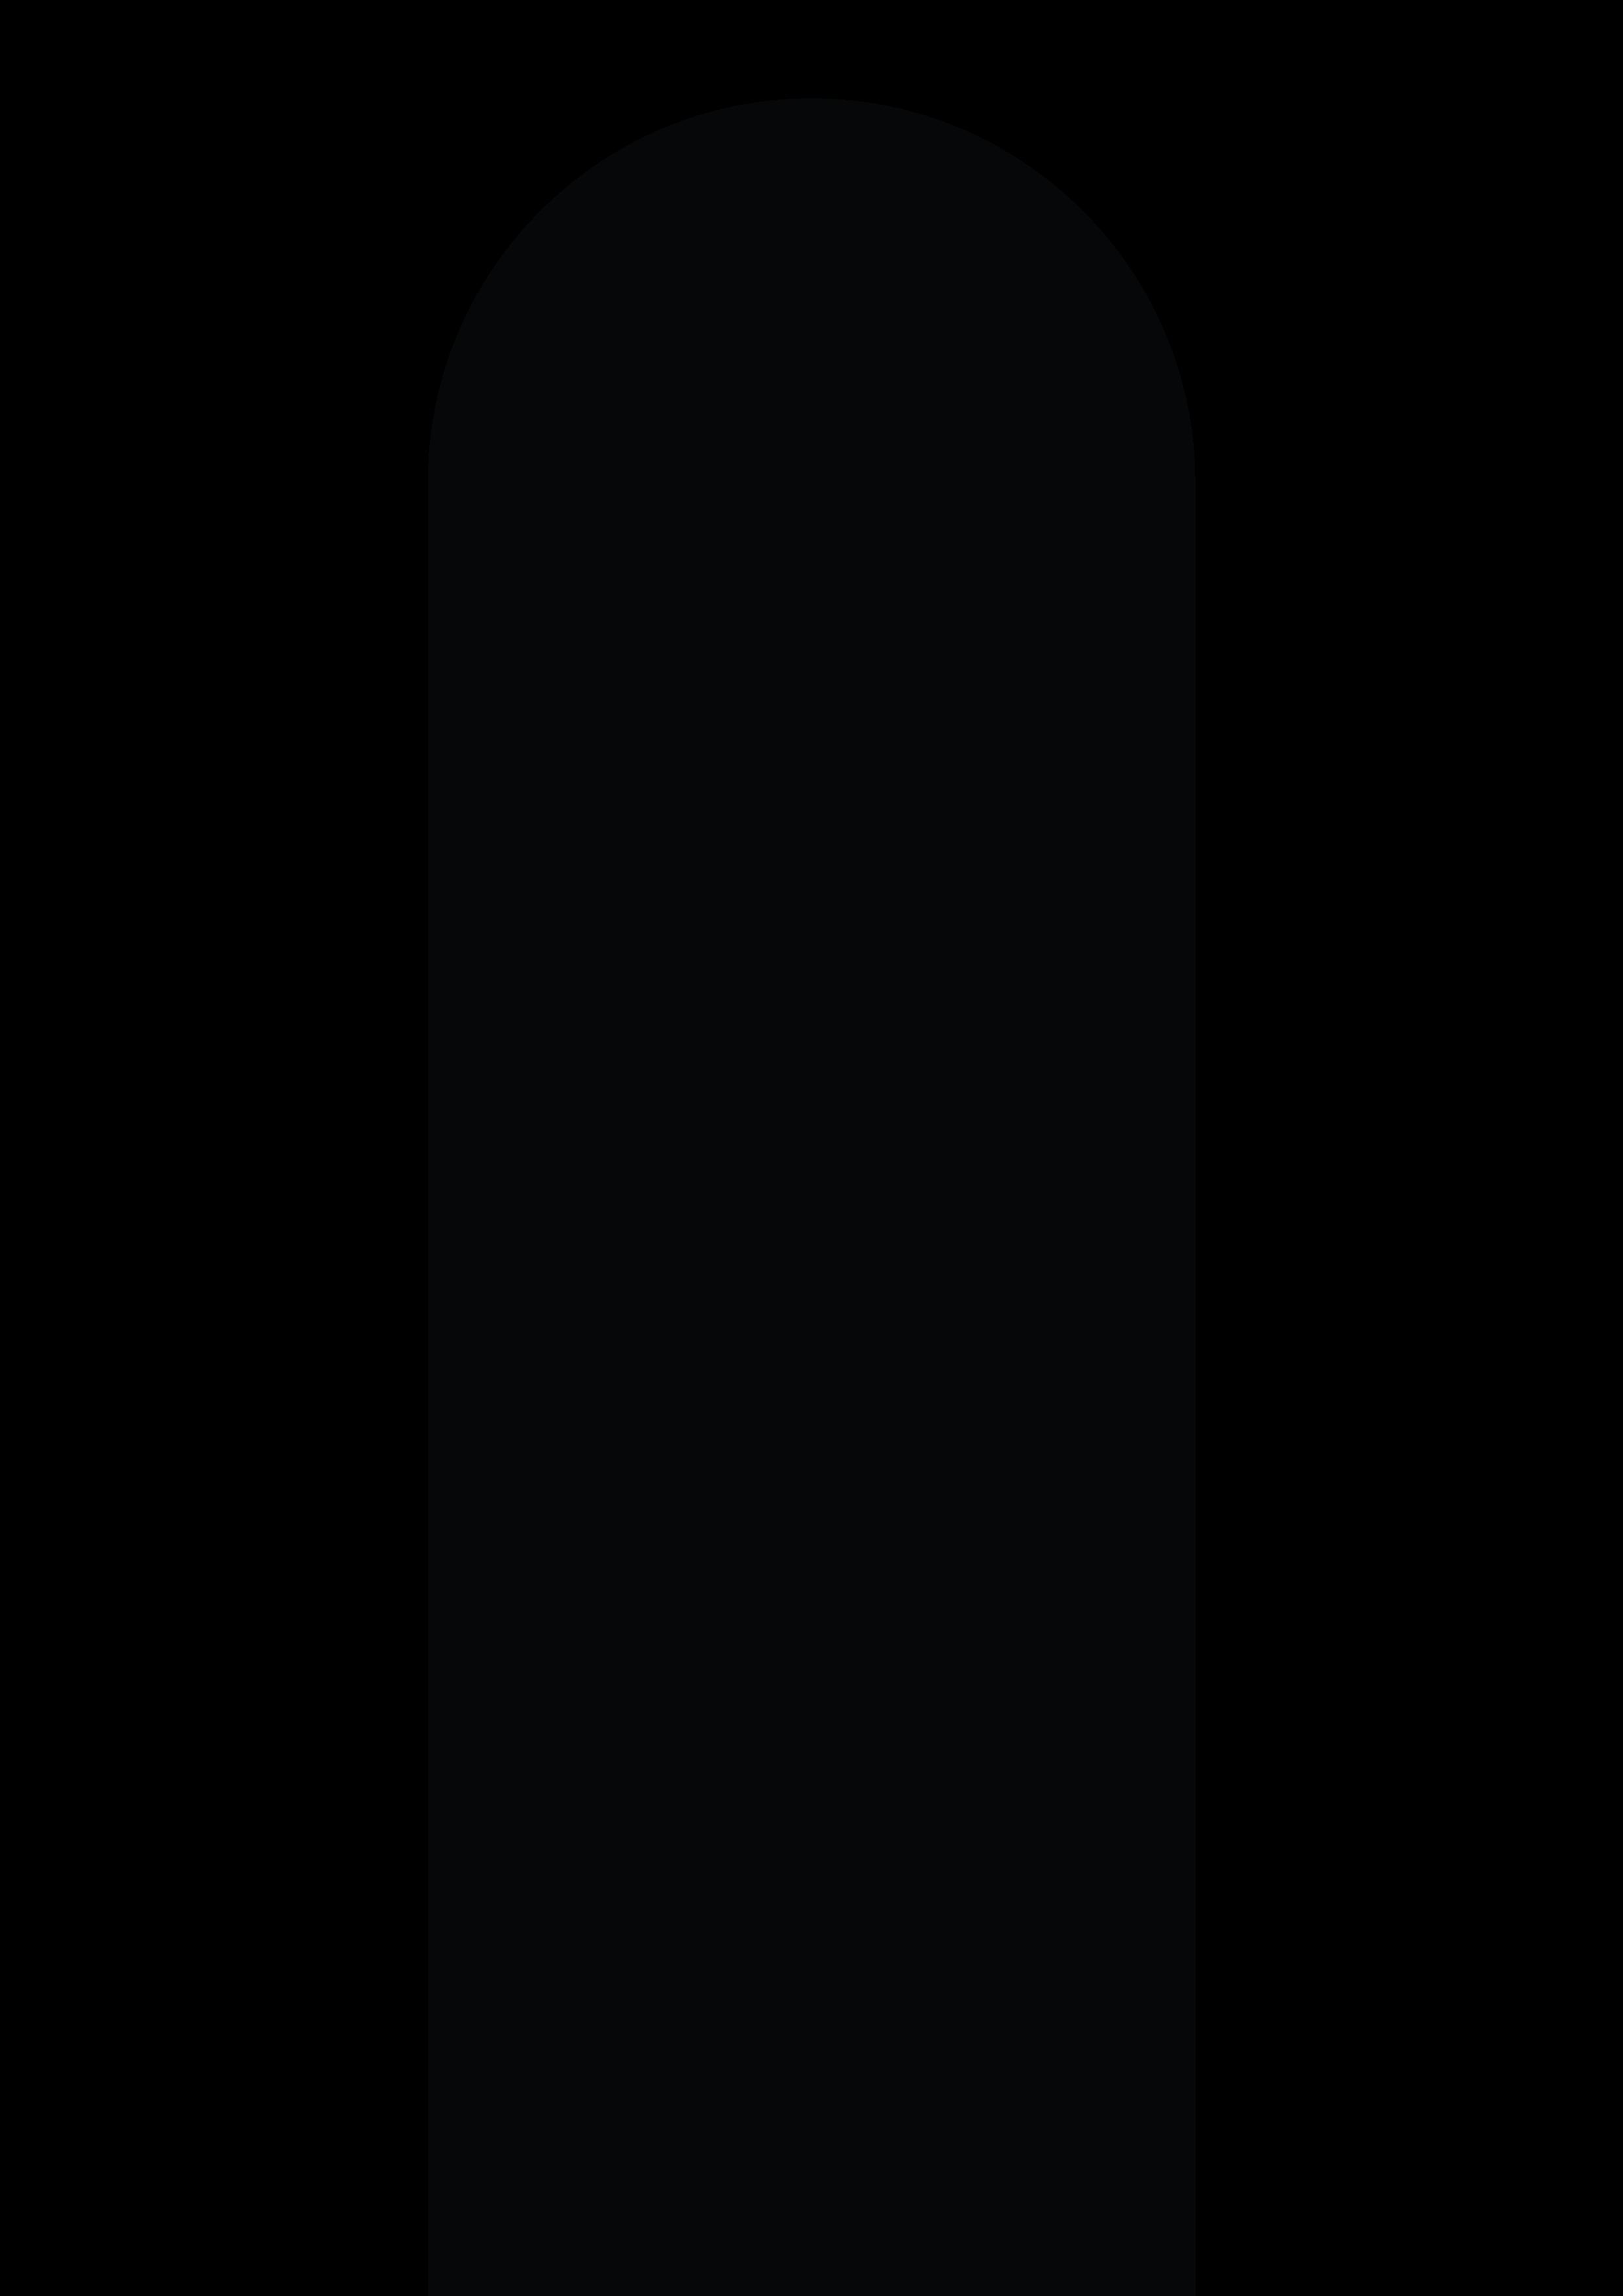 BINARY CODE-03.png